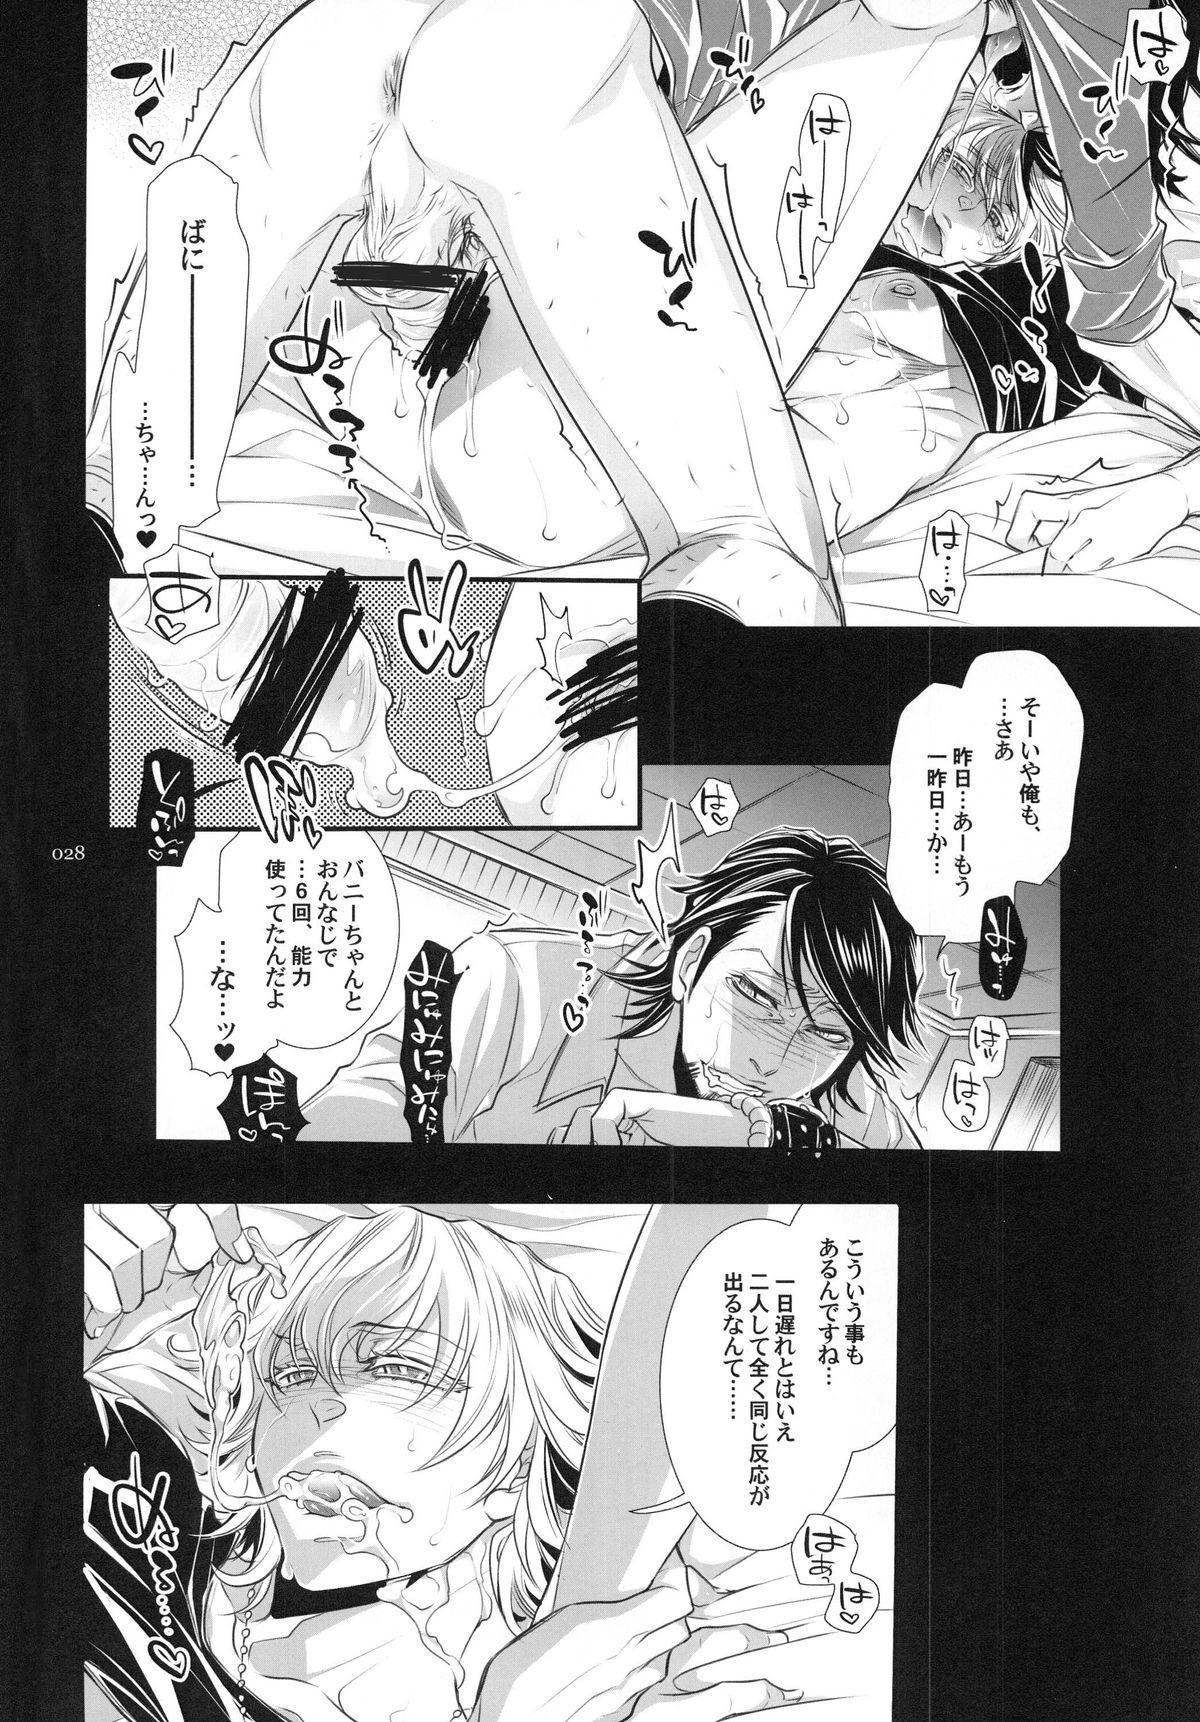 Bunny-chan to Iikoto Shiyokka 27